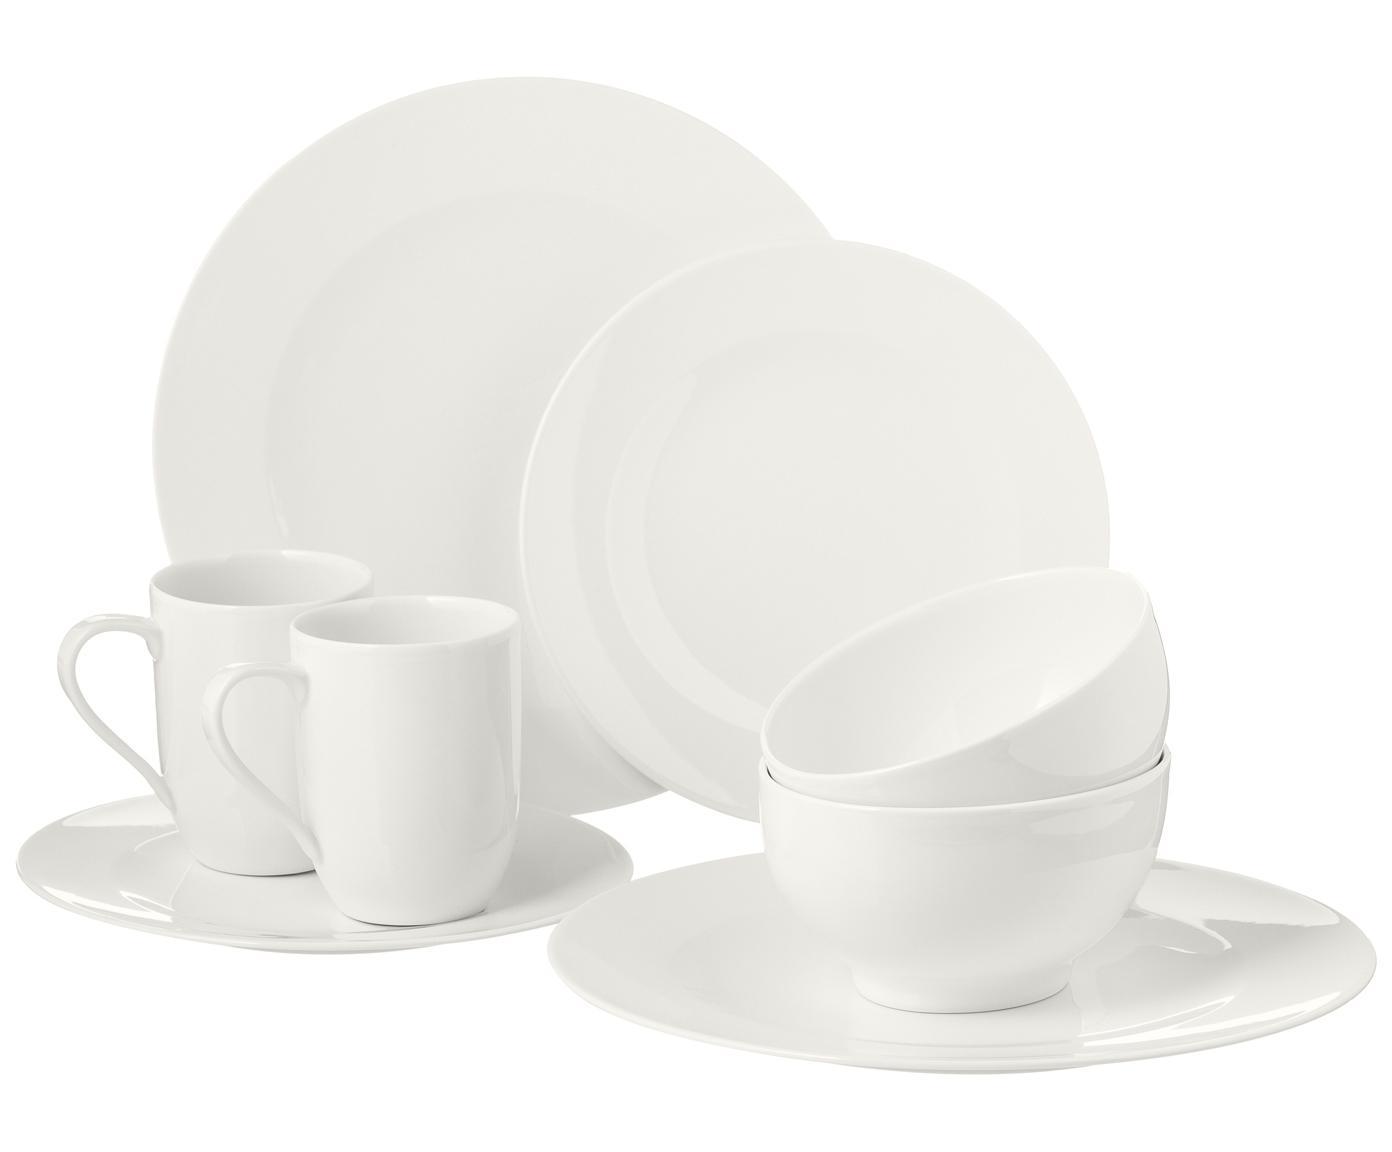 Set di stoviglie For Me 16 pz, Porcellana, Bianco latteo, Diverse dimensioni